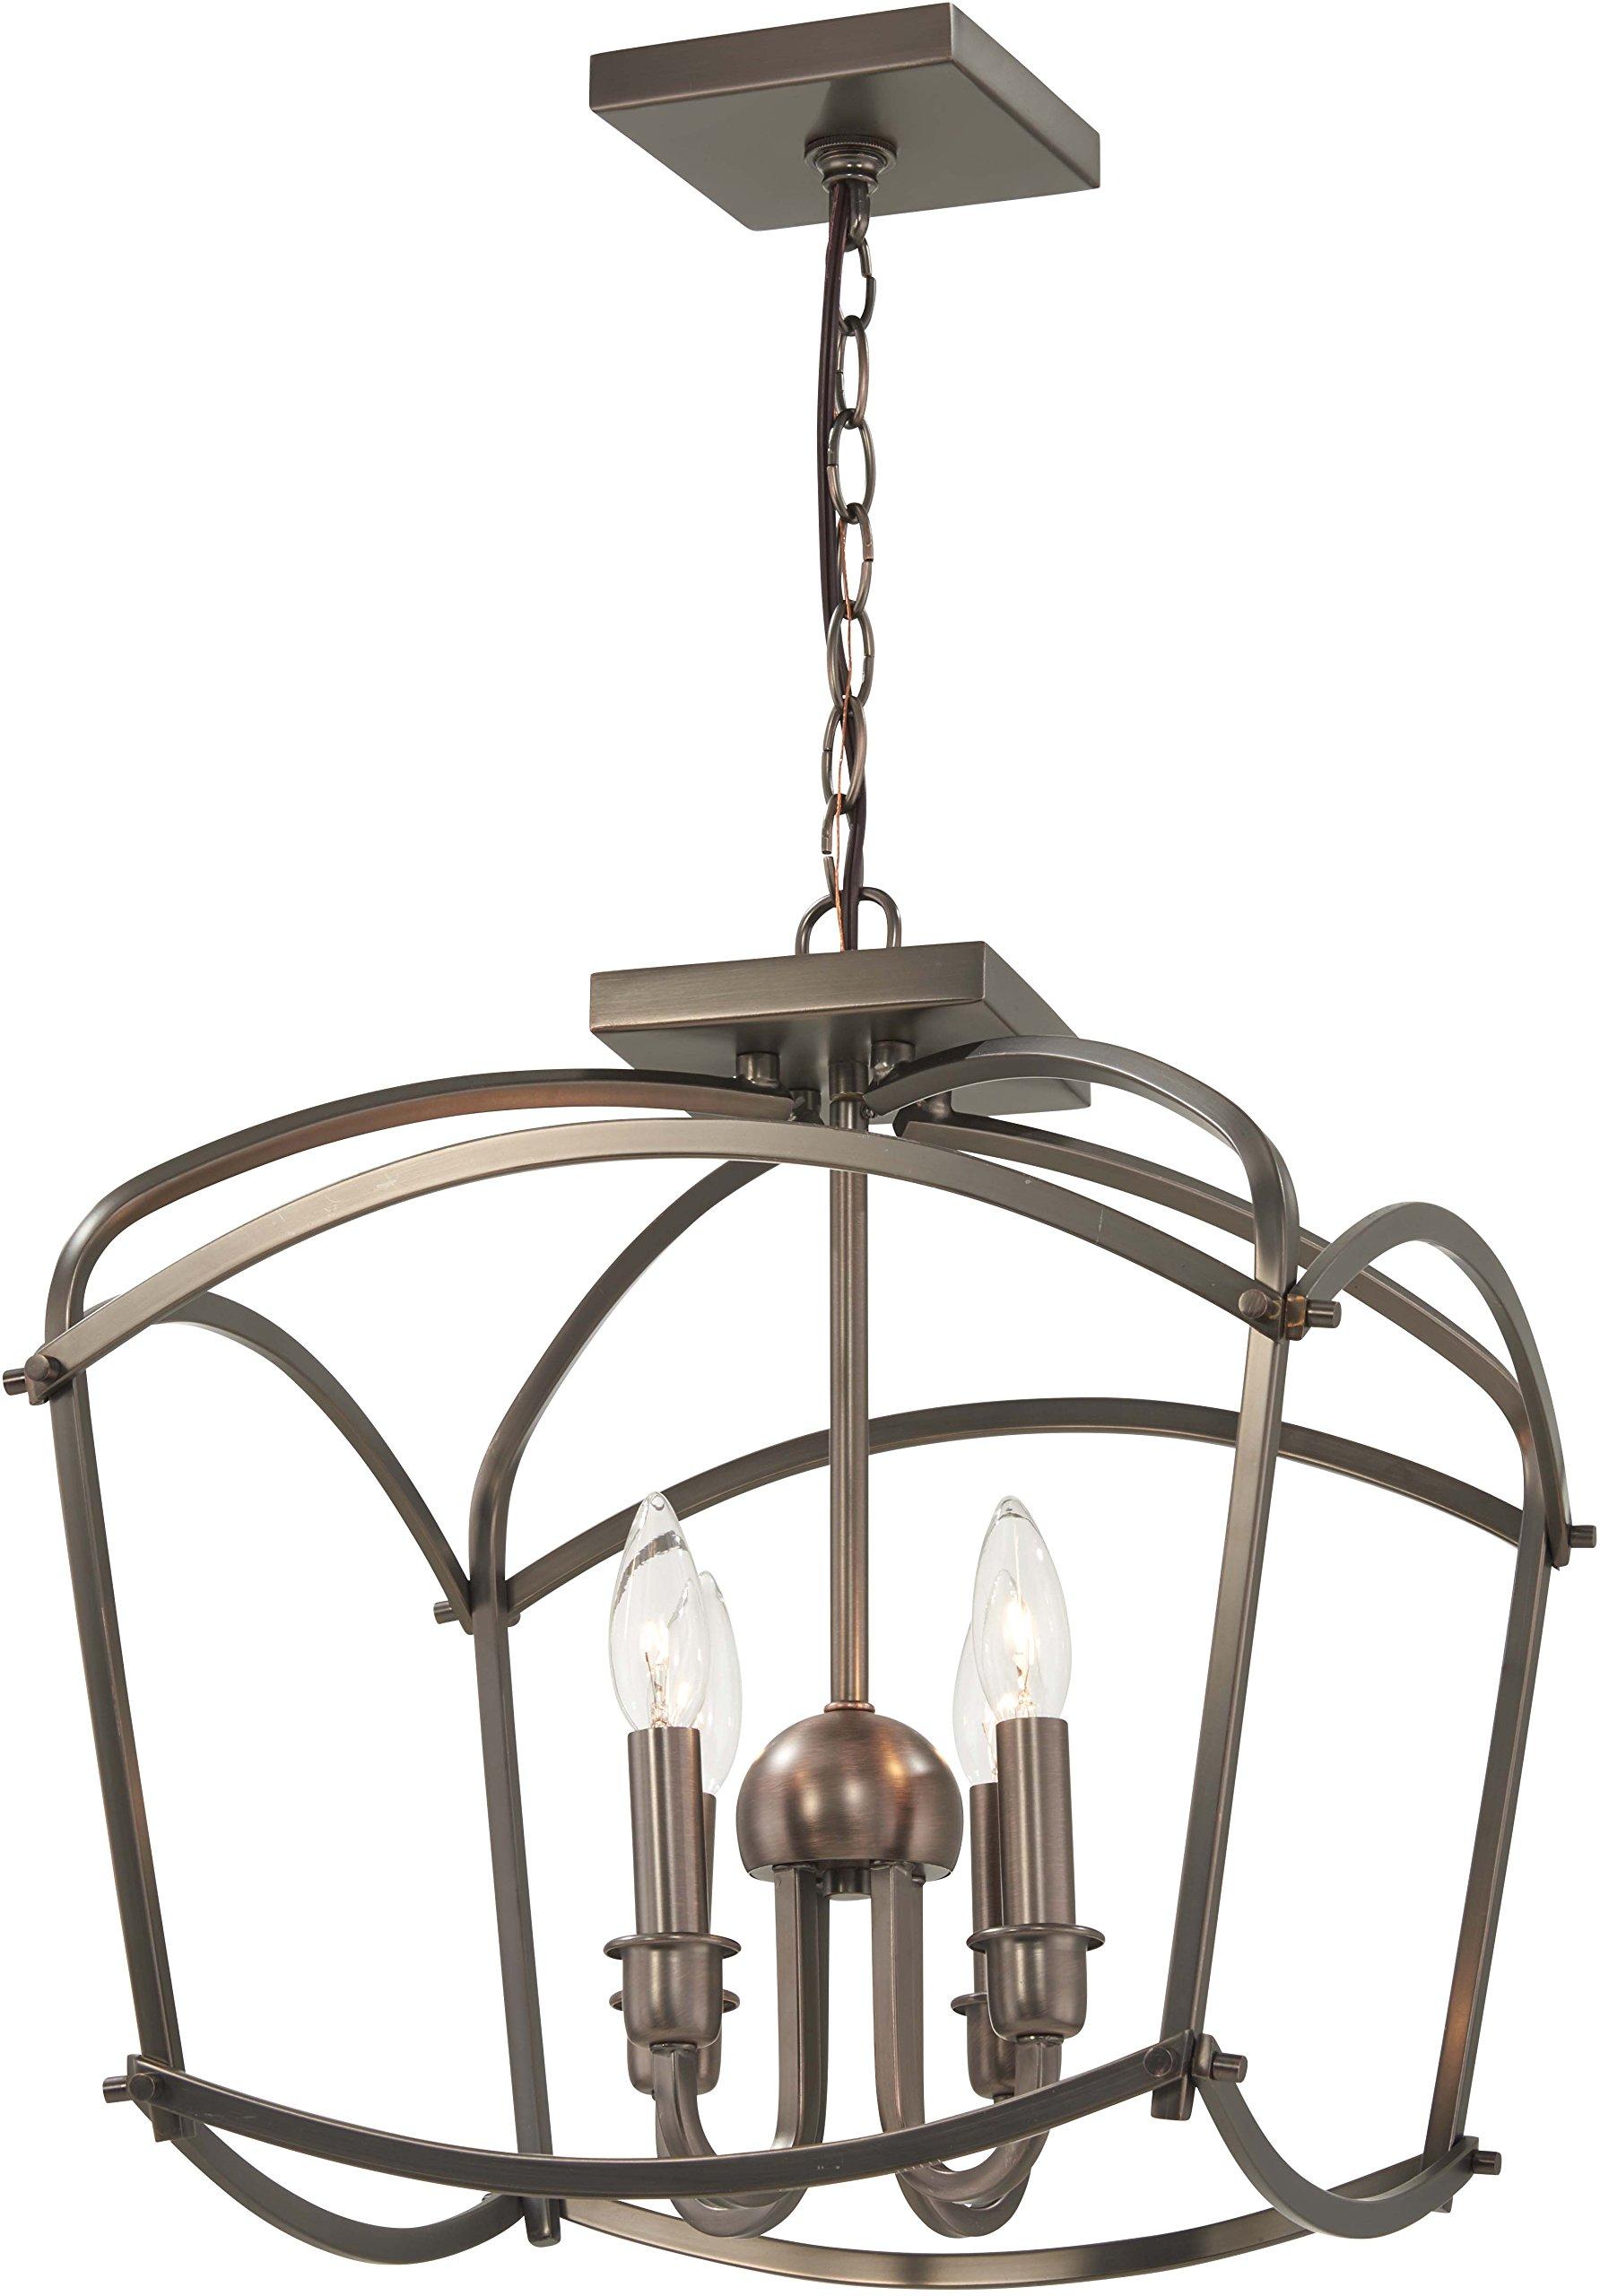 Minka Lavery Pendant Lantern Ceiling Lighting 4773-281 Jupiter's Canopy, 4-Light 240 Watts, Polished Nickel